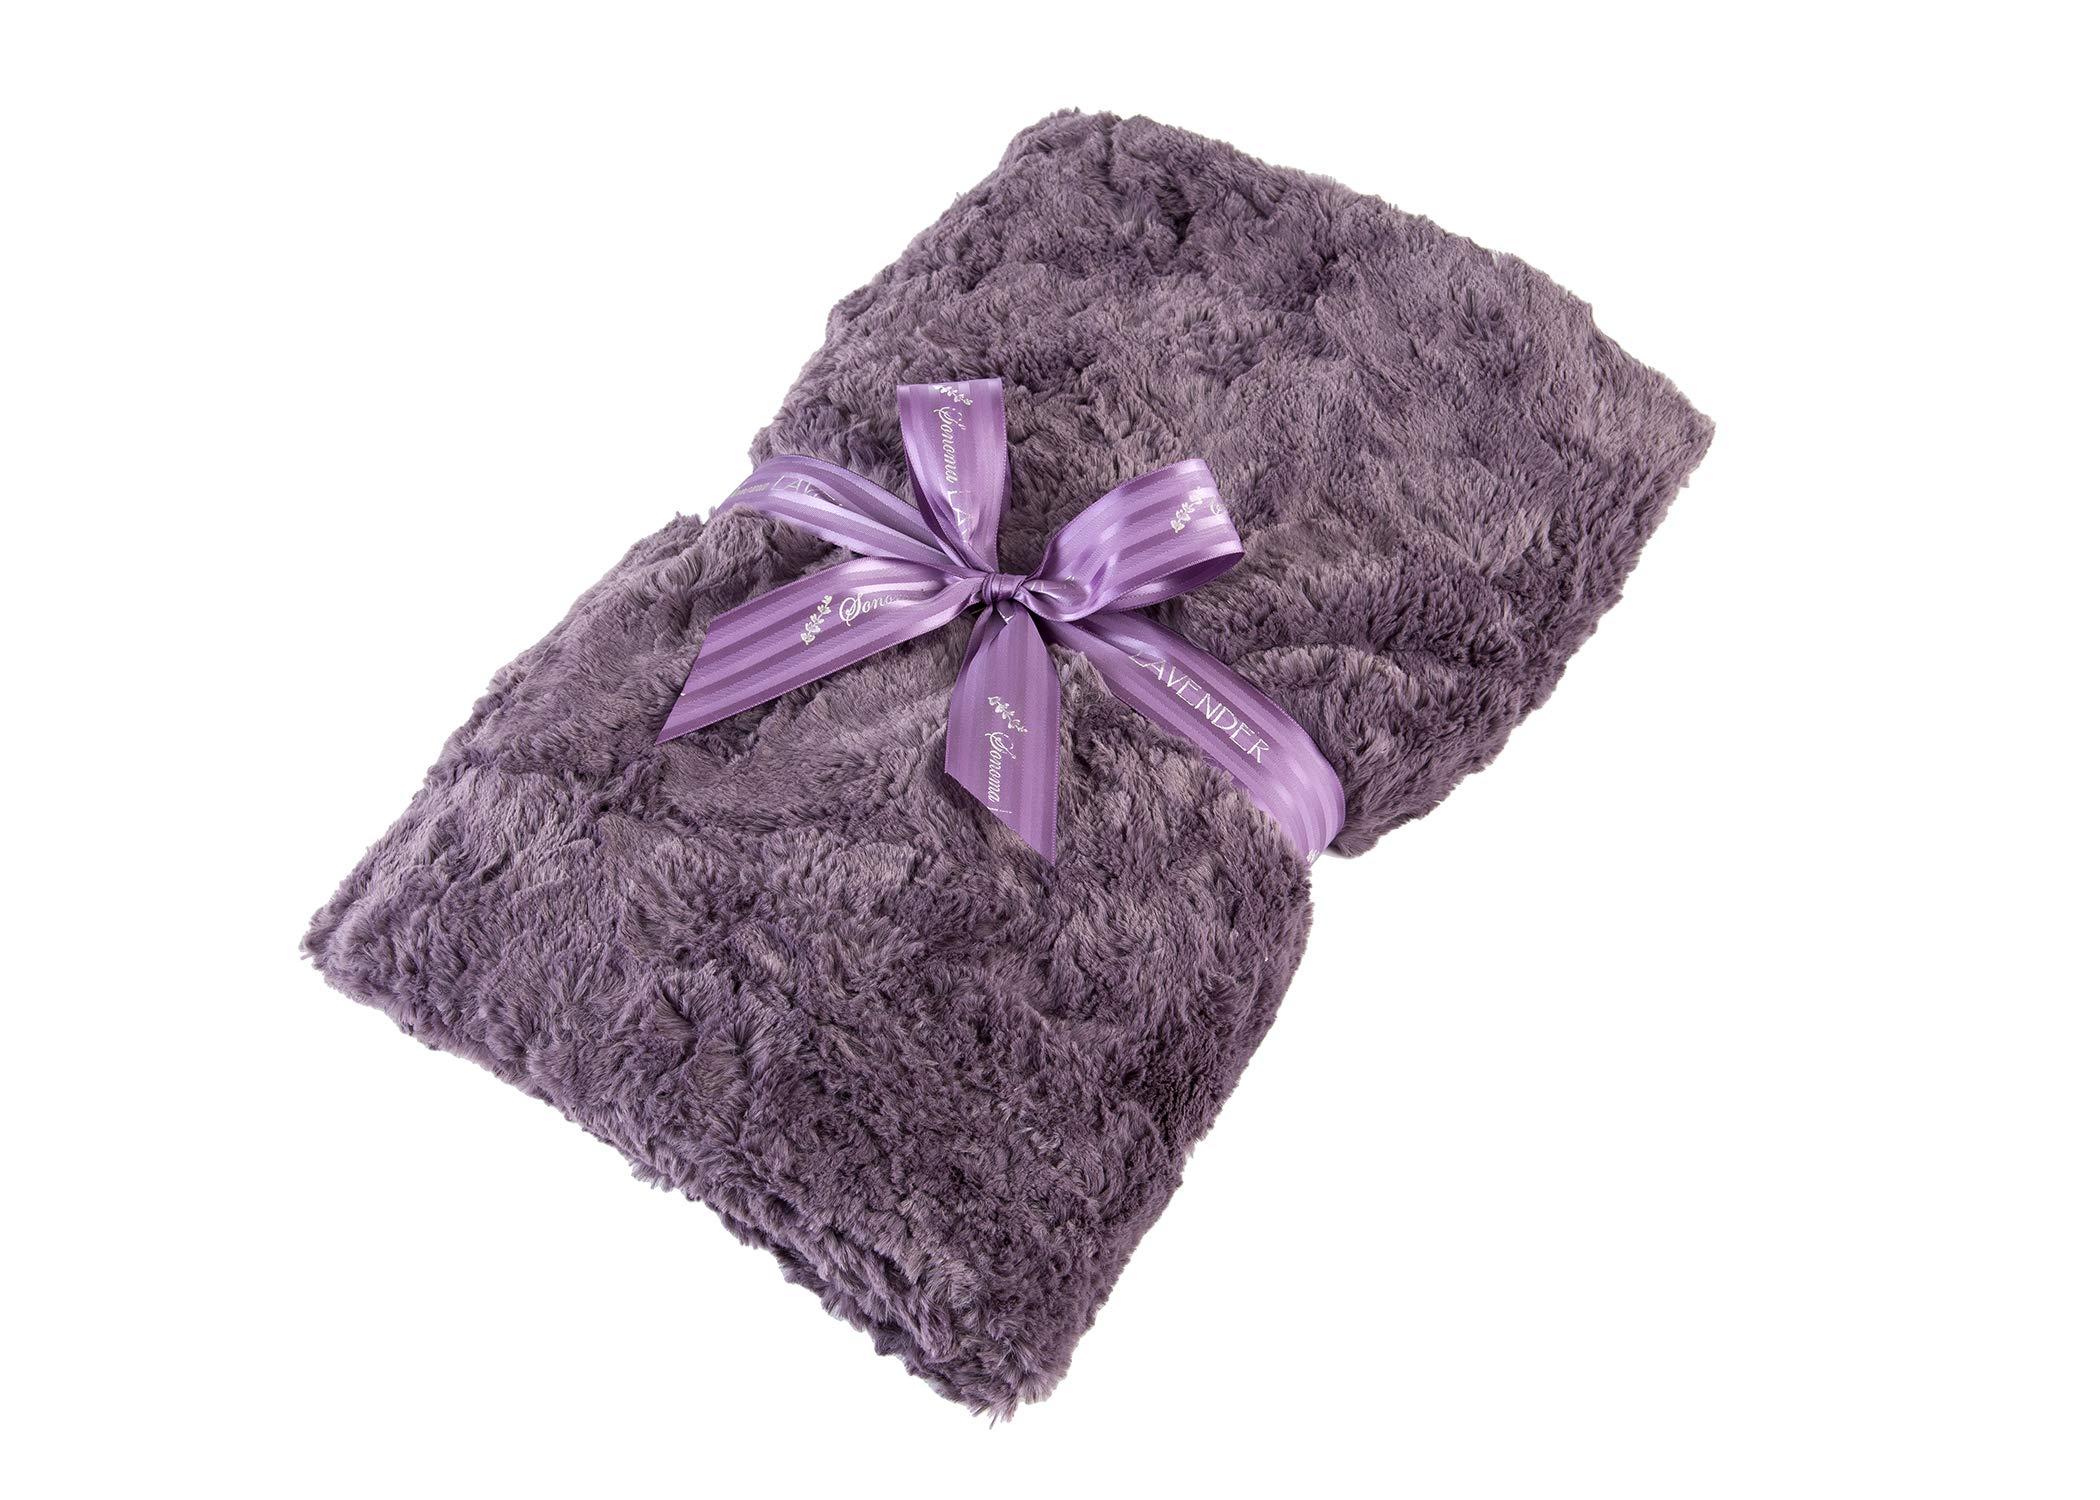 Sonoma Lavender Spa Blankie - Grapemist Lavender by Sonoma Lavender